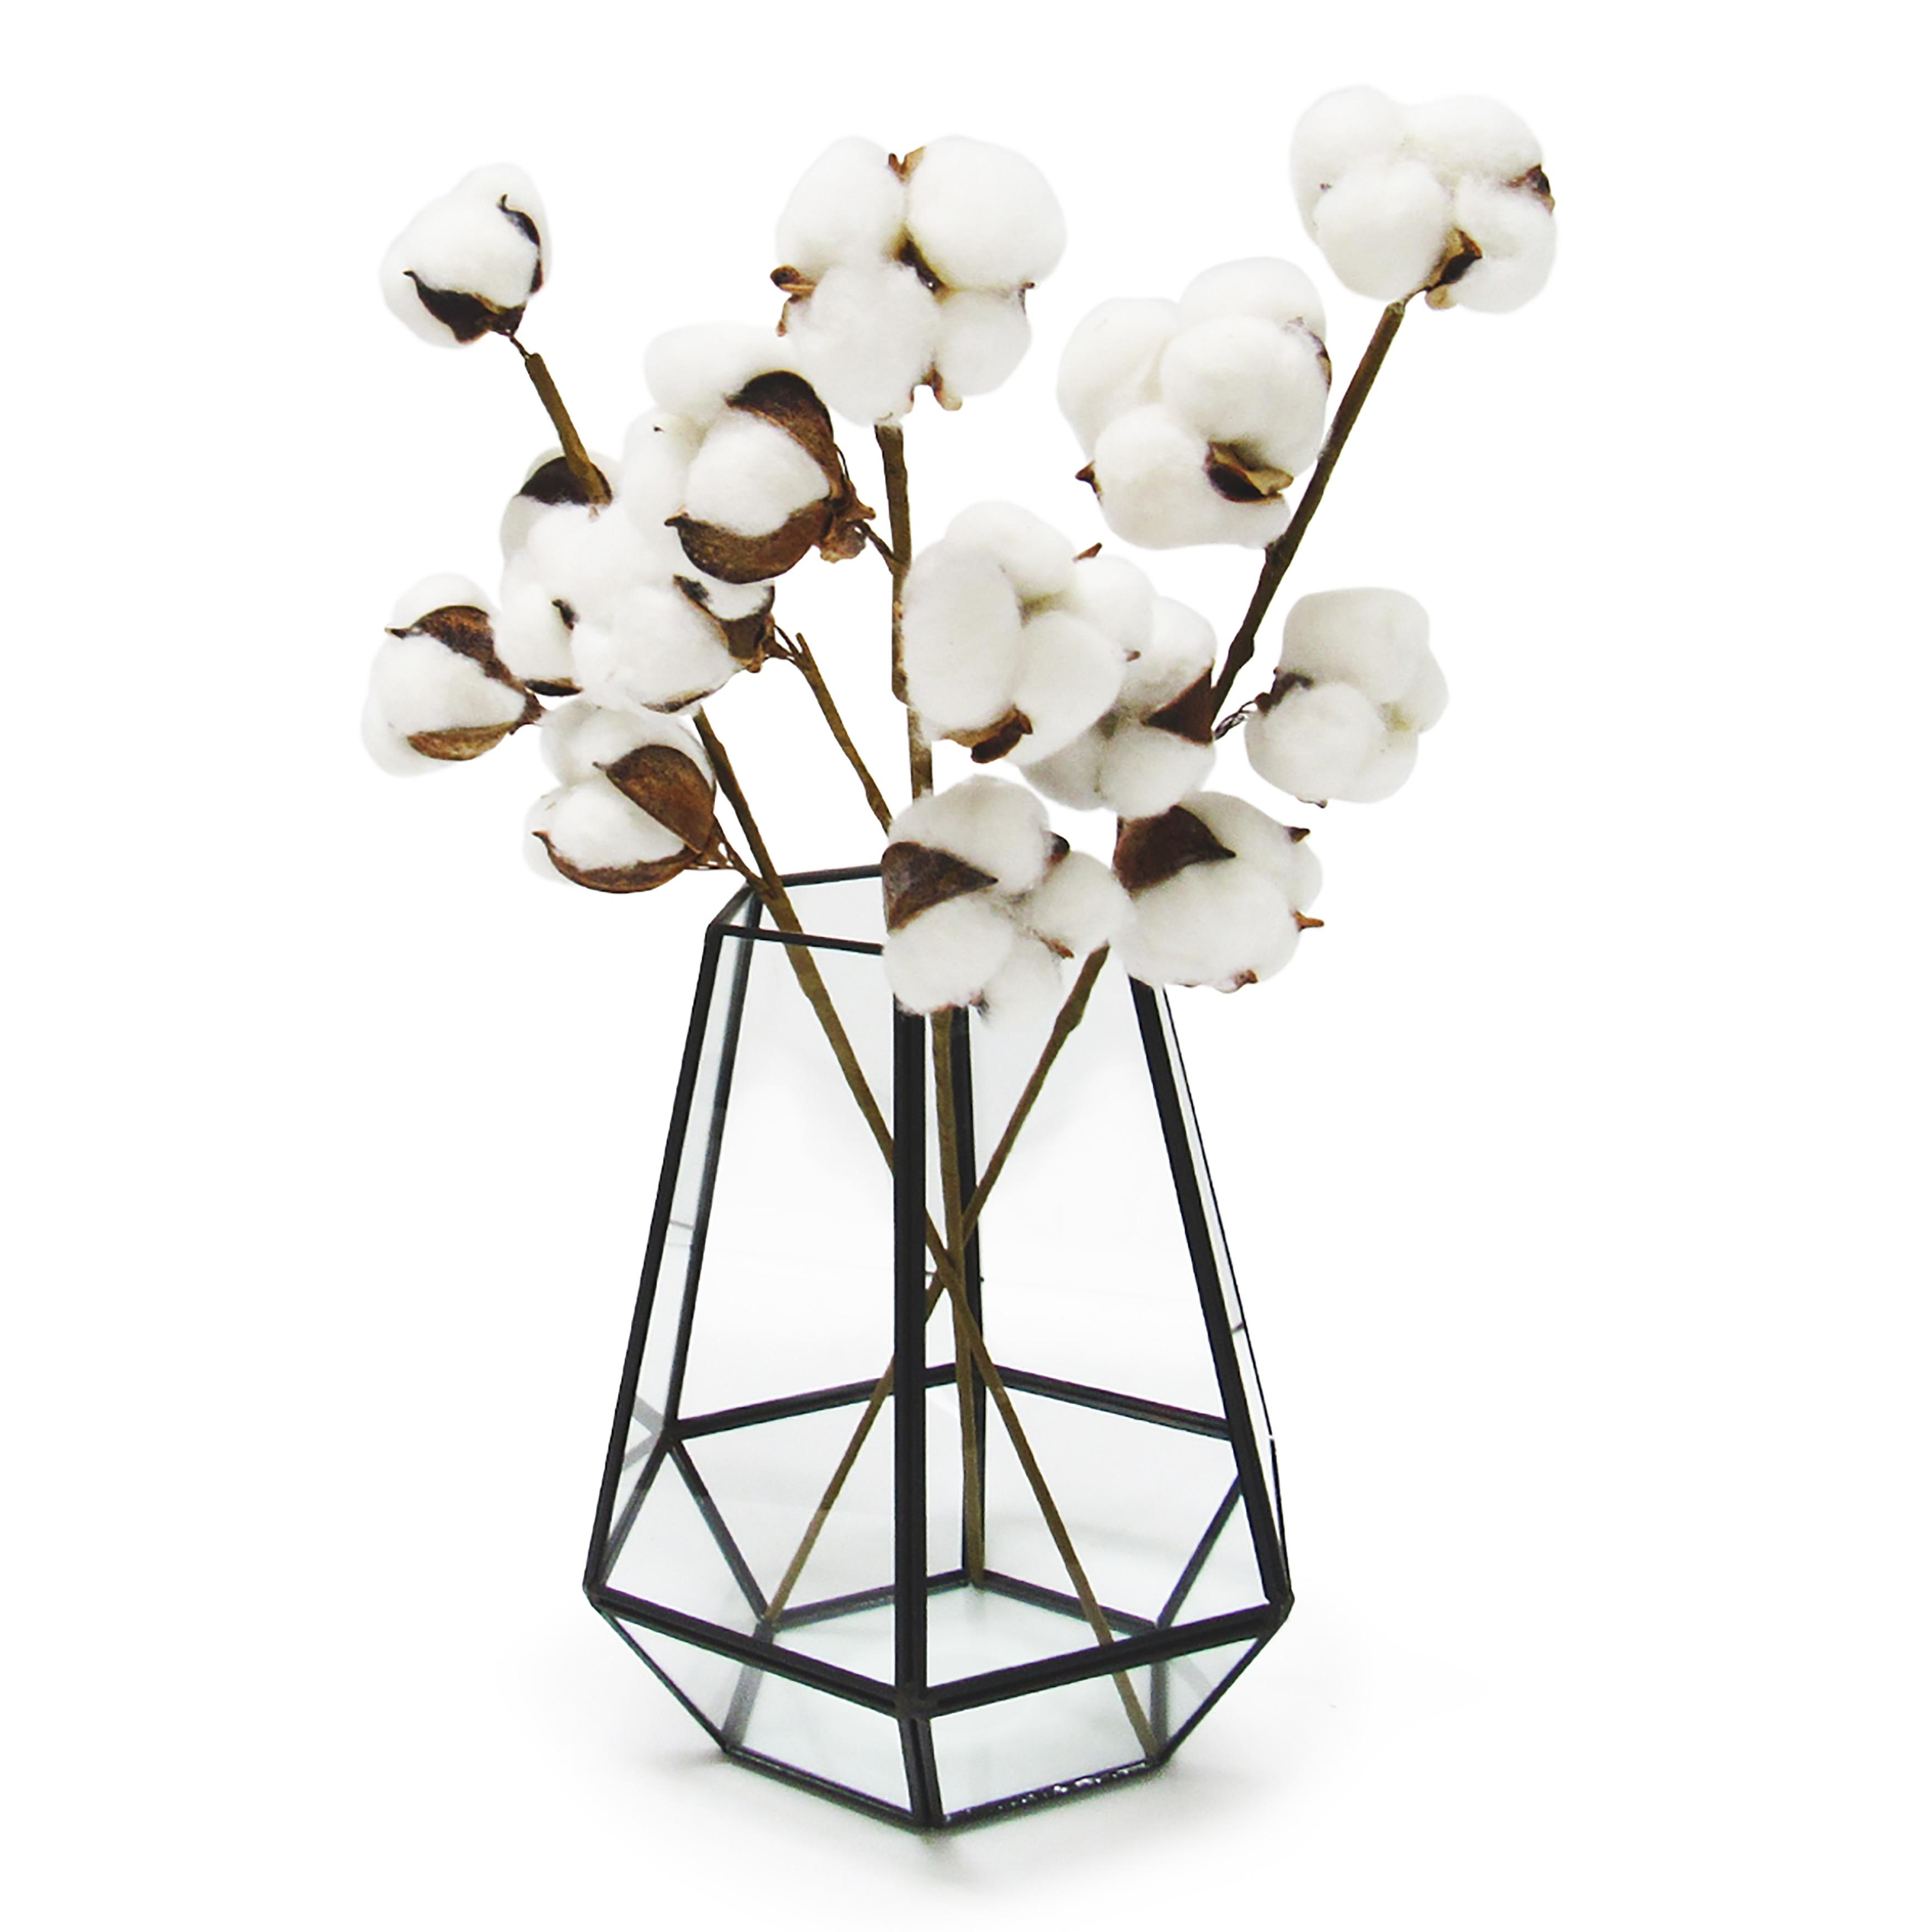 Set Of 3 Cotton Stem Branch 16in 16 L X 4 W X 2 Dp Overstock 32053735